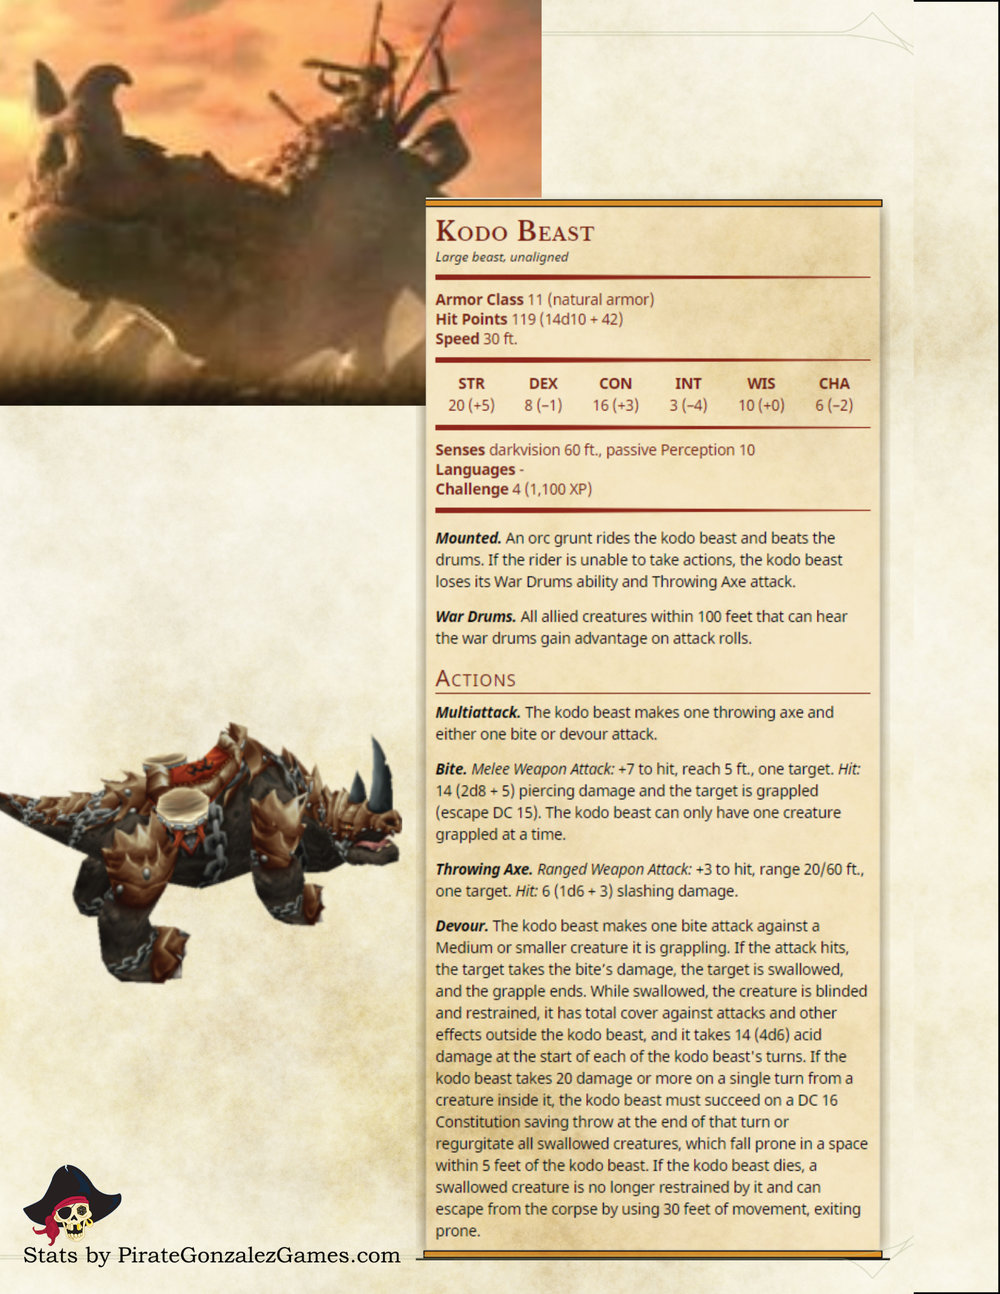 Kodo Beast